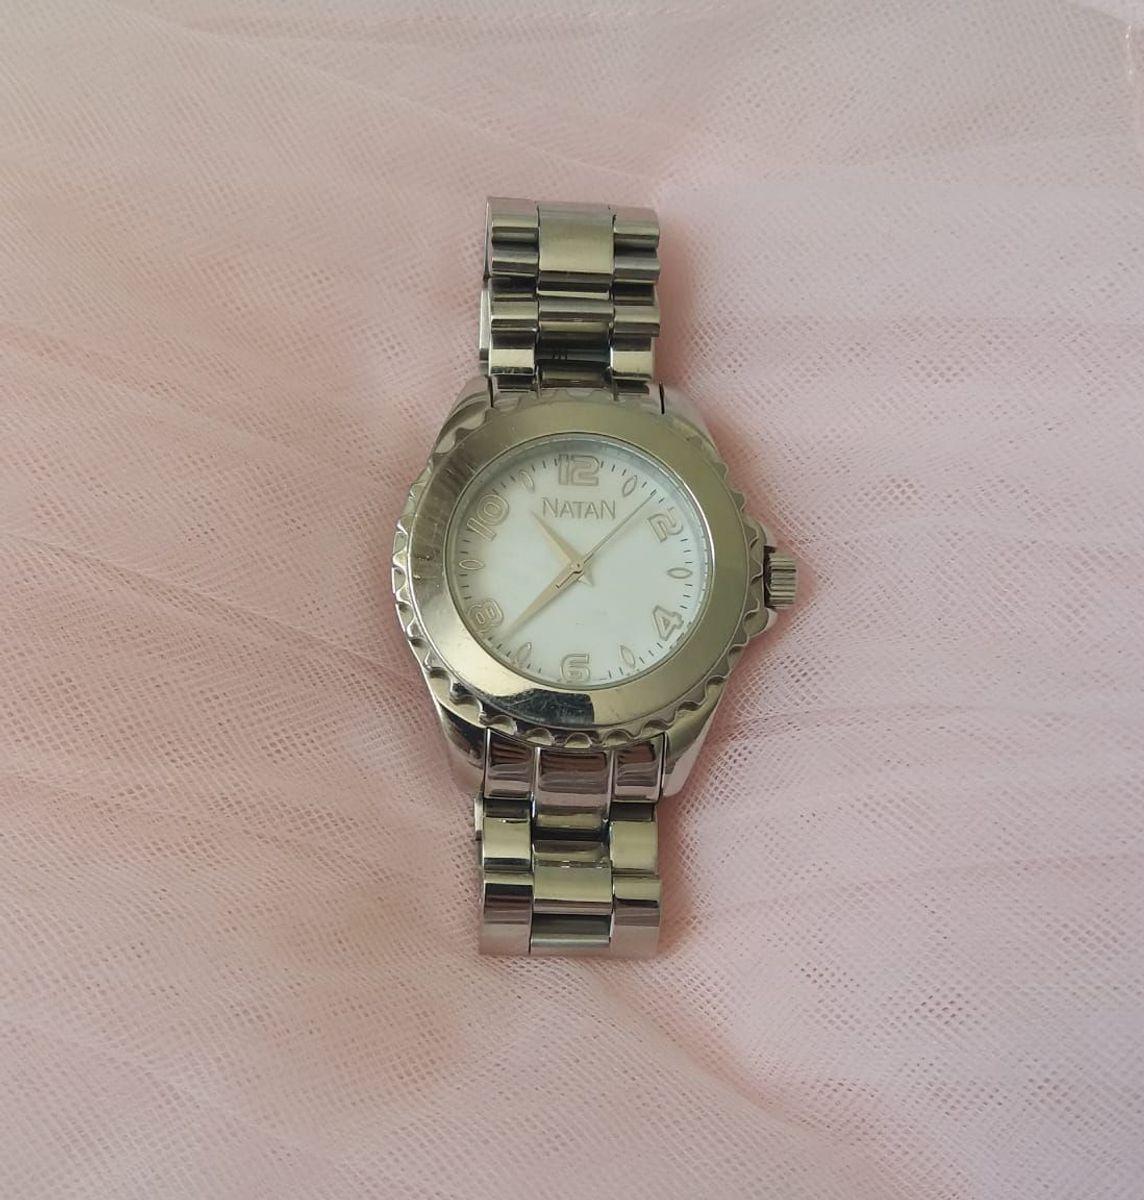 d842708a9df relógio natan - relógios natan.  Czm6ly9wag90b3muzw5qb2vplmnvbs5ici9wcm9kdwn0cy8xmdq5mdu3nc9kmty2mwrlmdjhzti3m2vkytmxyzm1n2i0zmjjnmqxzi5qcgc  ...